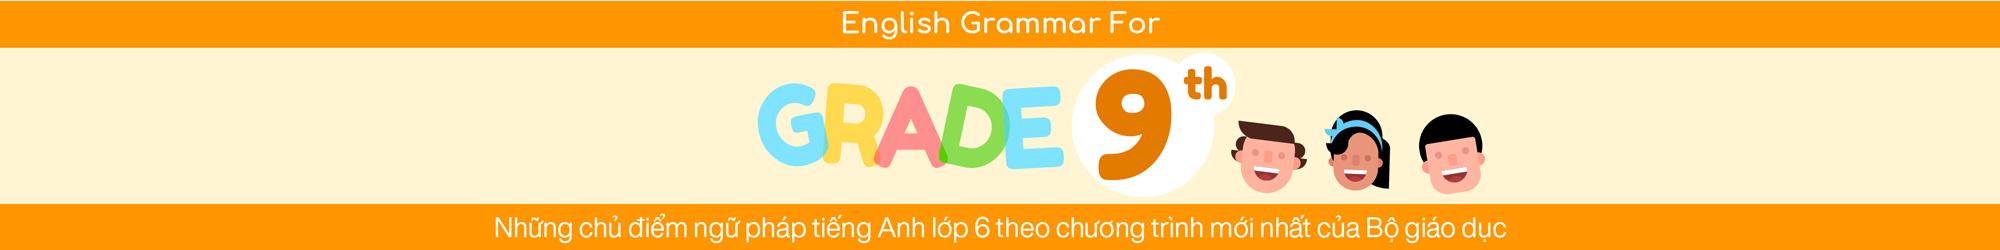 ENGLISH GRAMMAR FOR 9TH GRADE banner